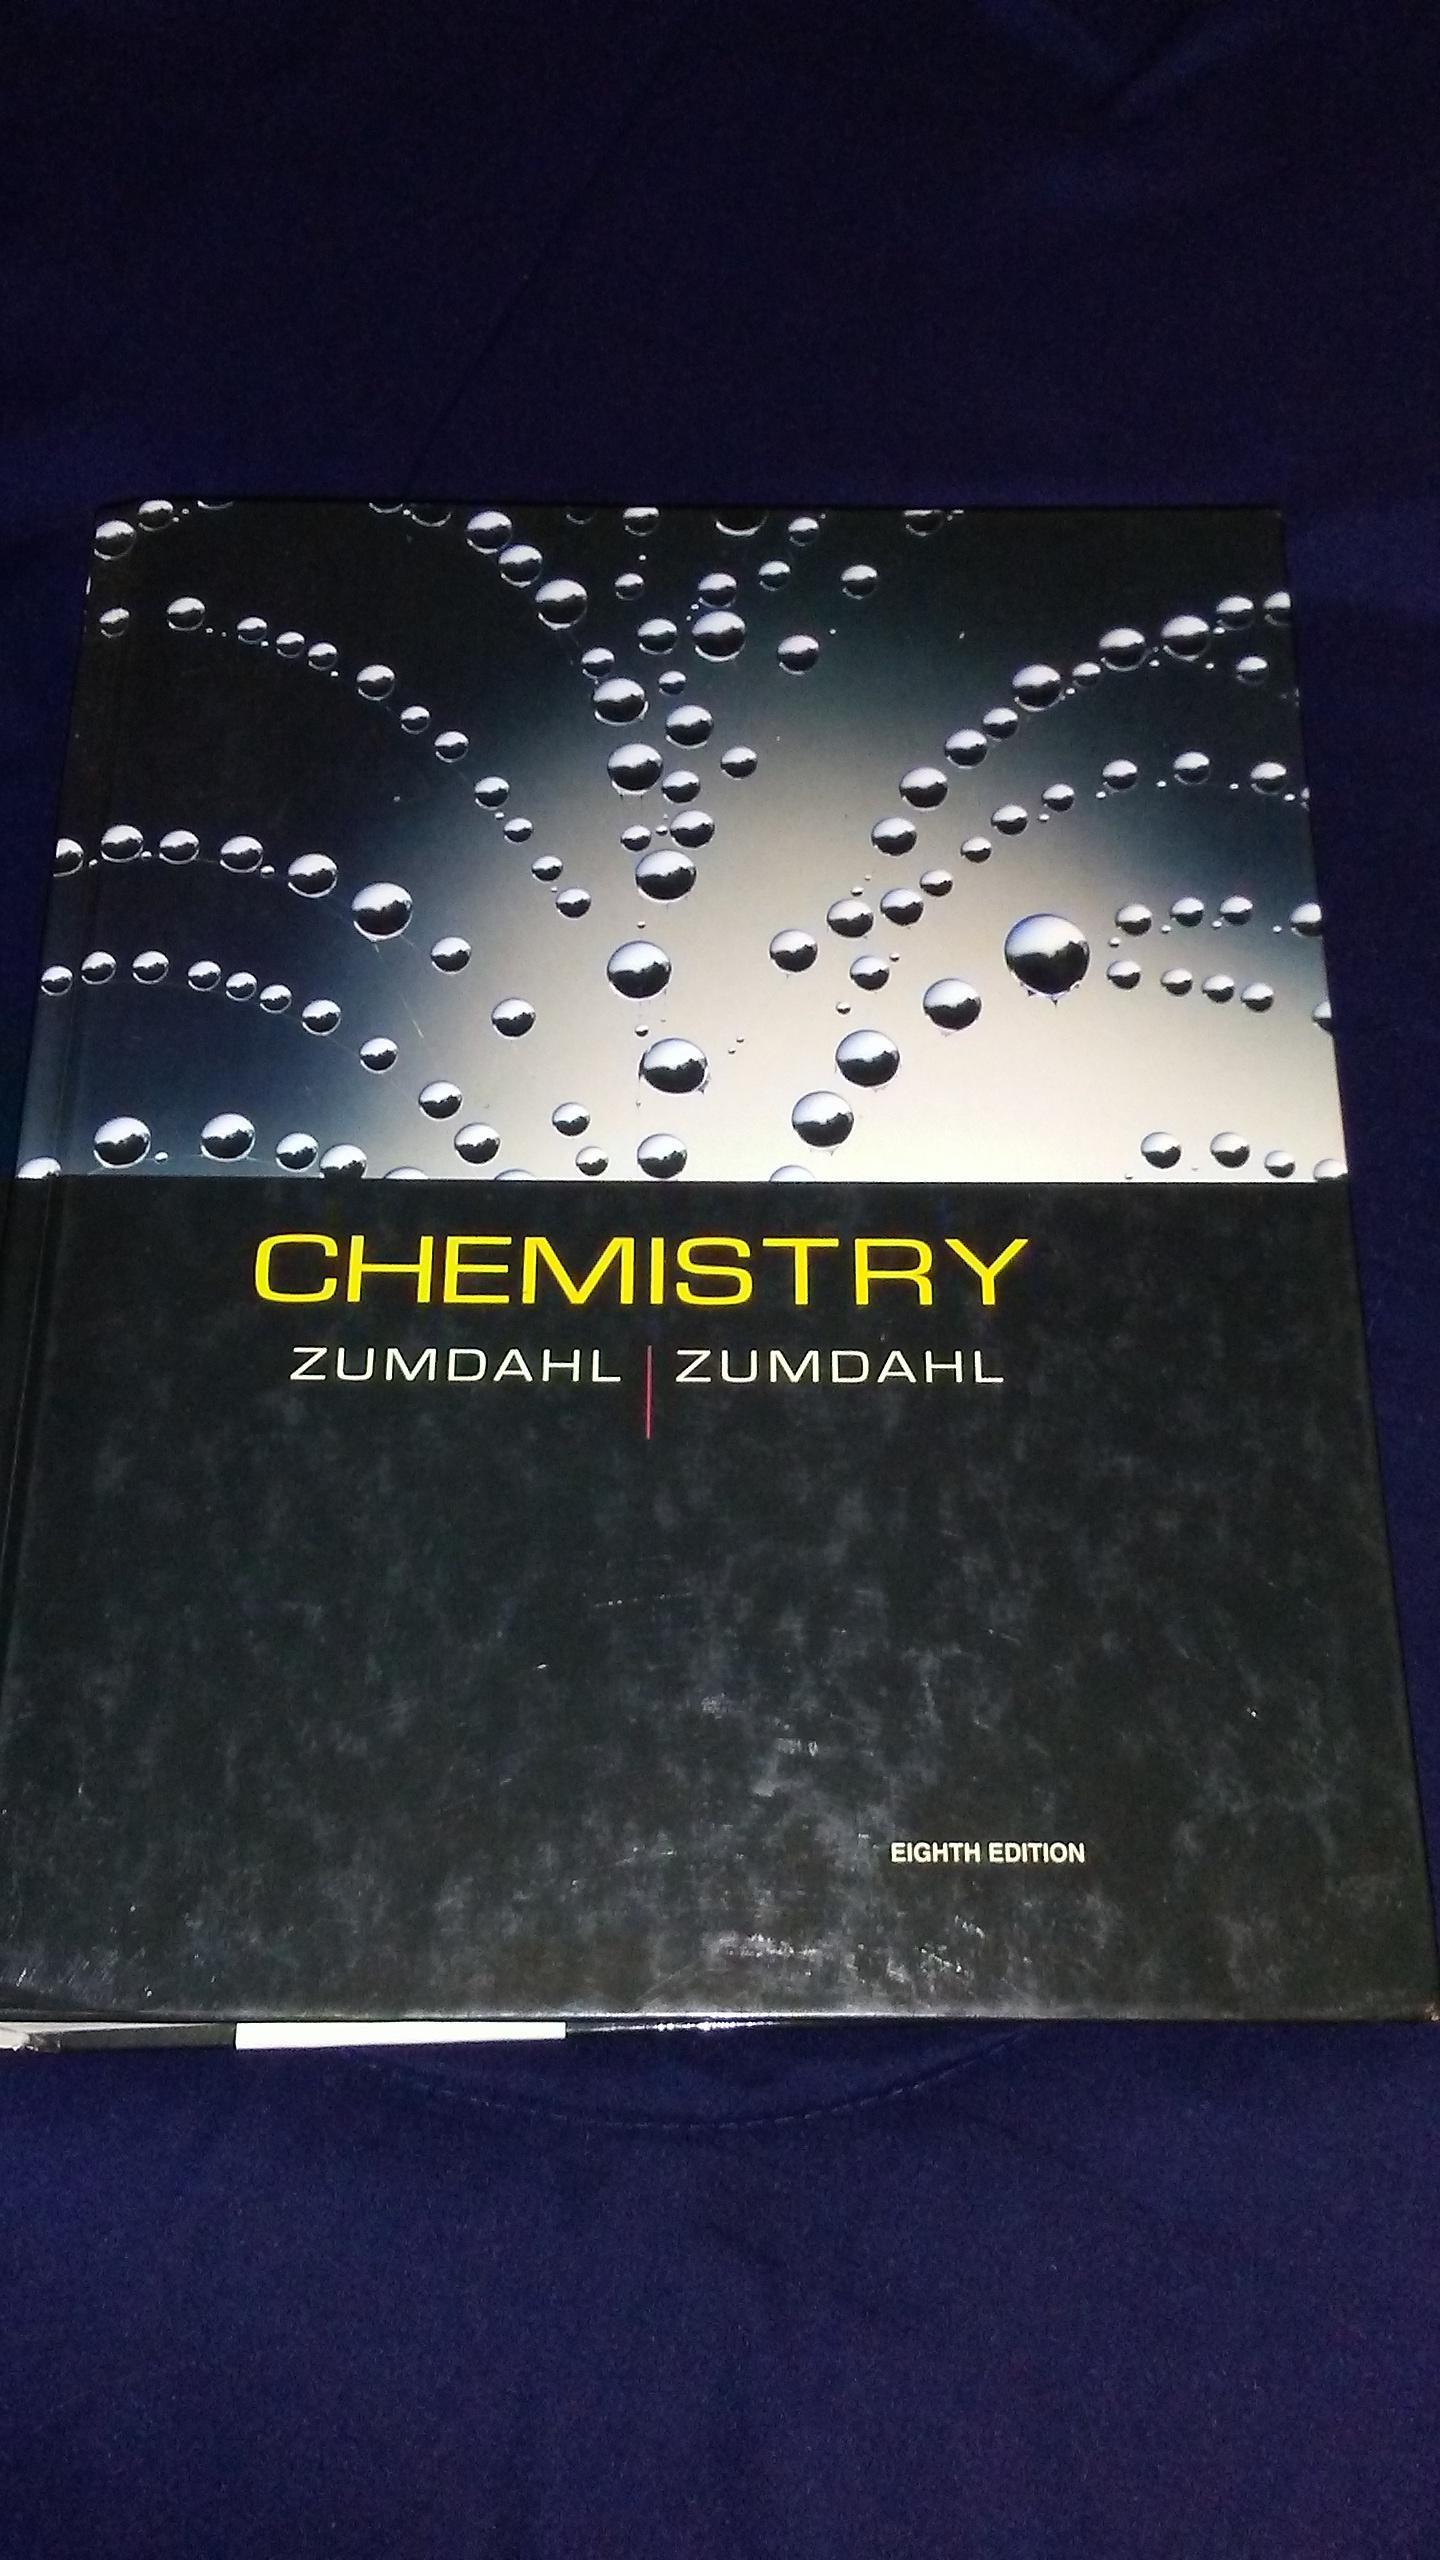 Zumdahl Chemistry 8th Edition Pdf Free Download